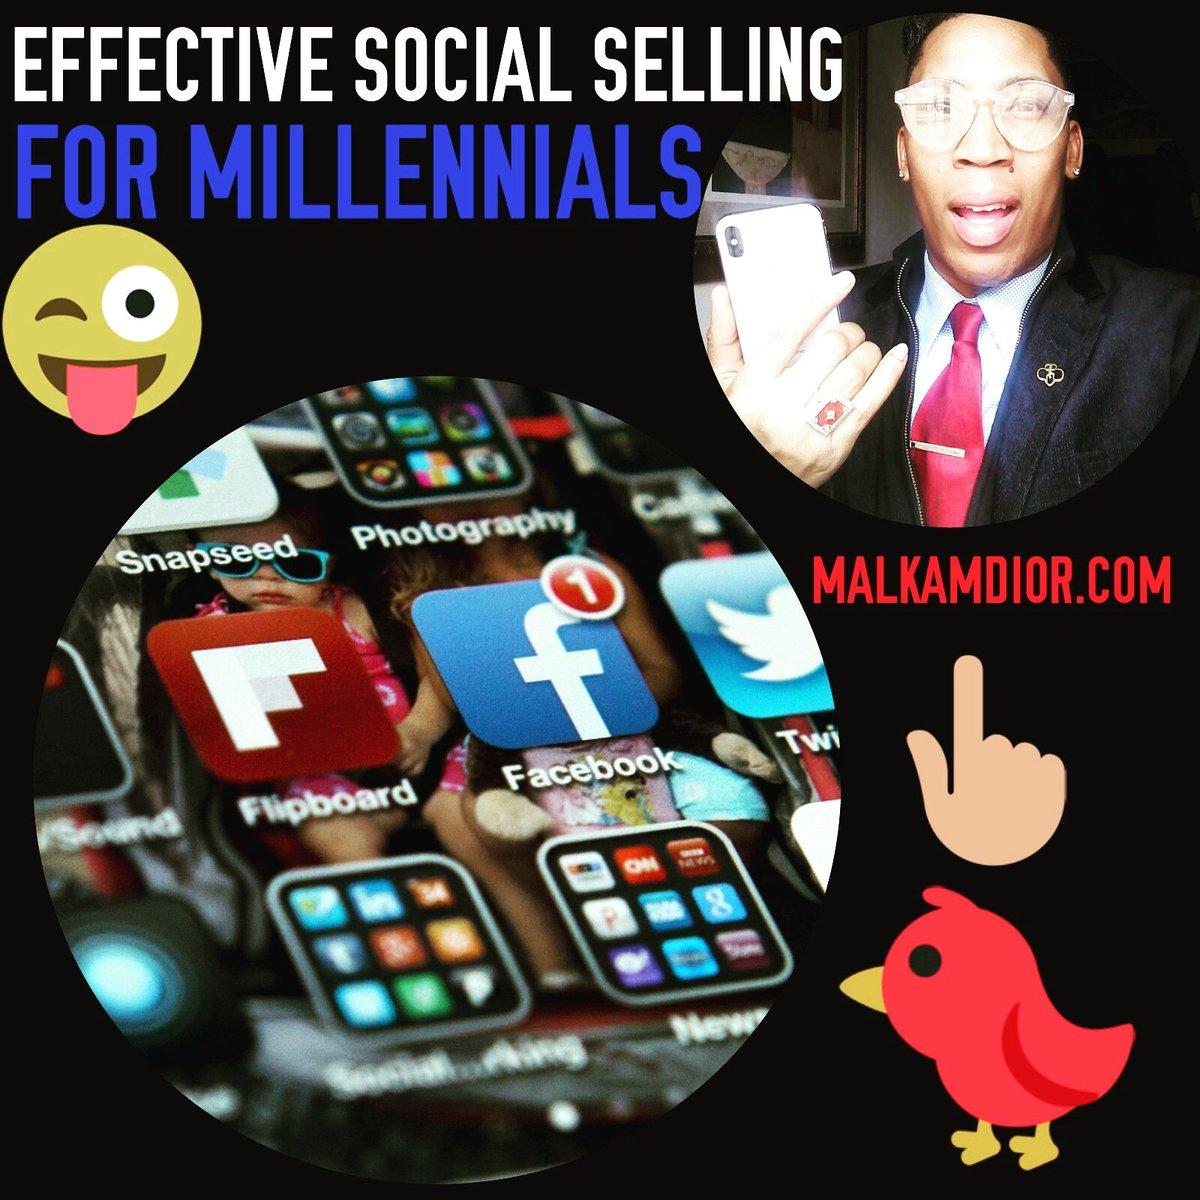 Learn about Effective Social Media Selling for Millennials -  http:// MalkamDior.com  &nbsp;    #SocialMedia #DigitalMarketing #Smtip #ContentMarketing #SMM #SMO #SEO #SEM #defstar5 #Contentstrategy #GrowthHacking #spdc #InboundMarketing  #InternetMarketing  https:// seo-malkamdior.blogspot.com/2018/04/effect ive-social-selling-for.html?m=1 &nbsp; … <br>http://pic.twitter.com/ZAJy7kK7JP &ndash; à Millennial Advisers, LLC.